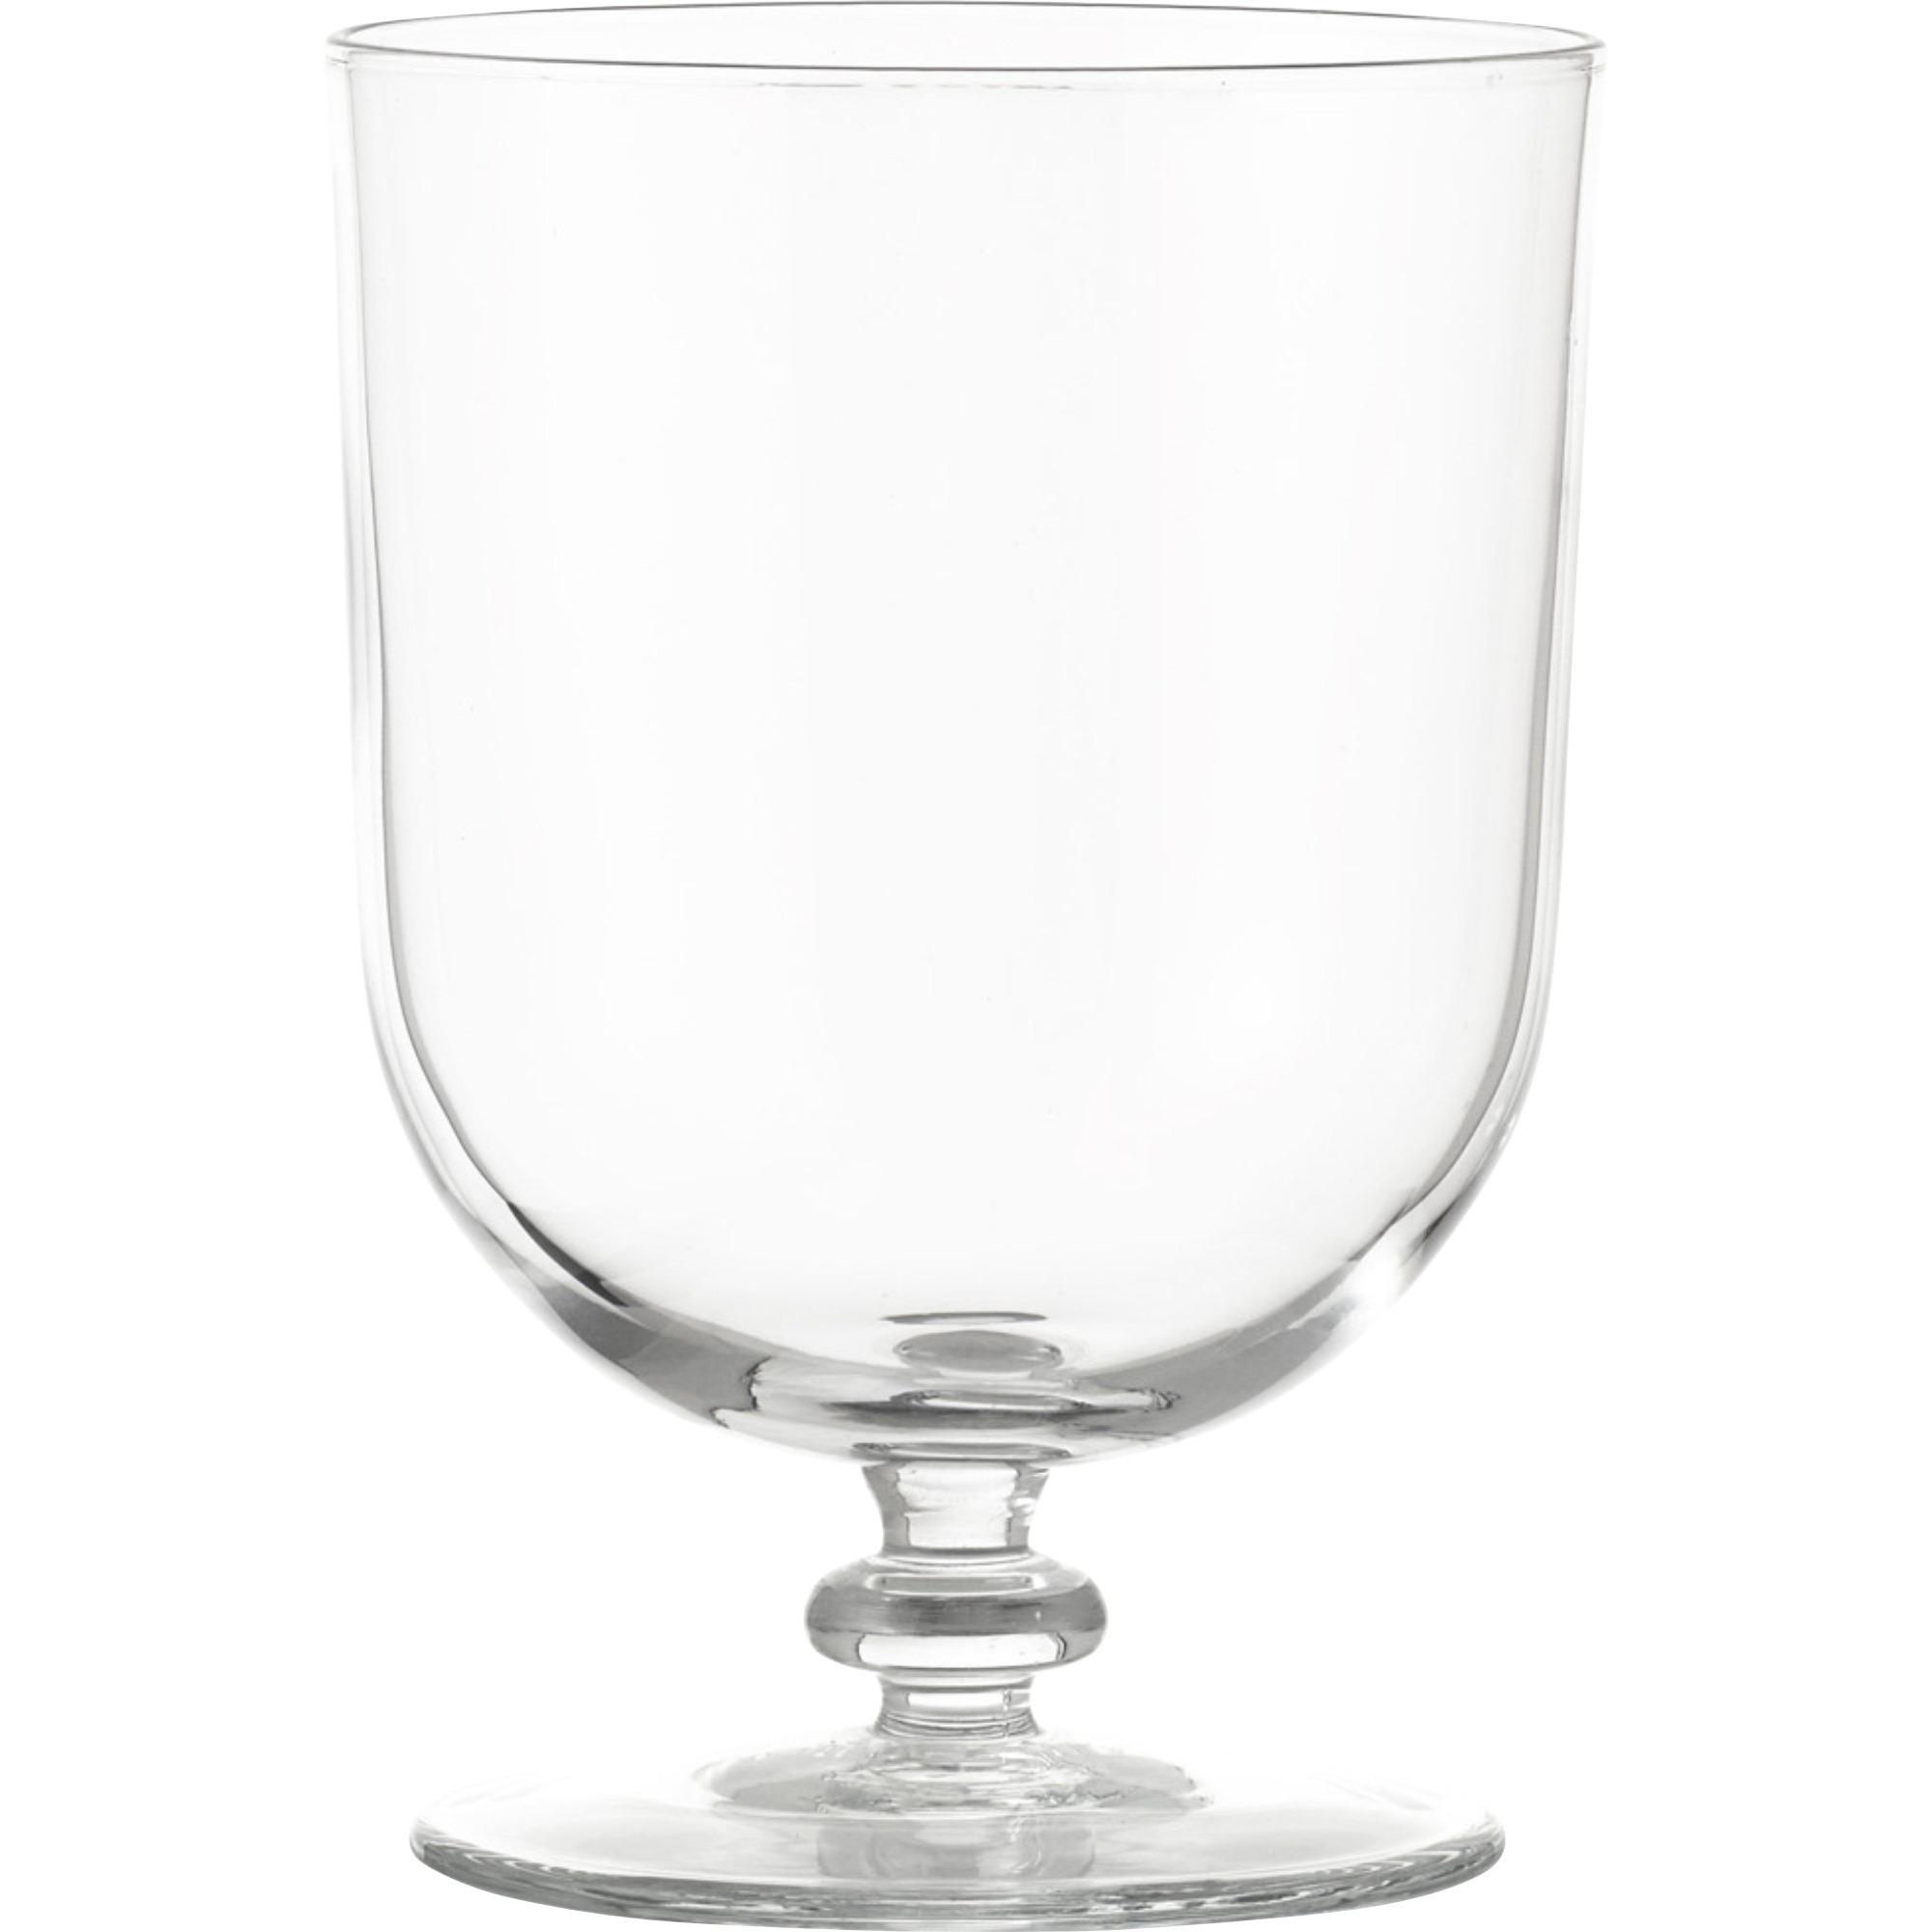 Normann Copenhagen Banquet Vatten Glas 30 cl Klar